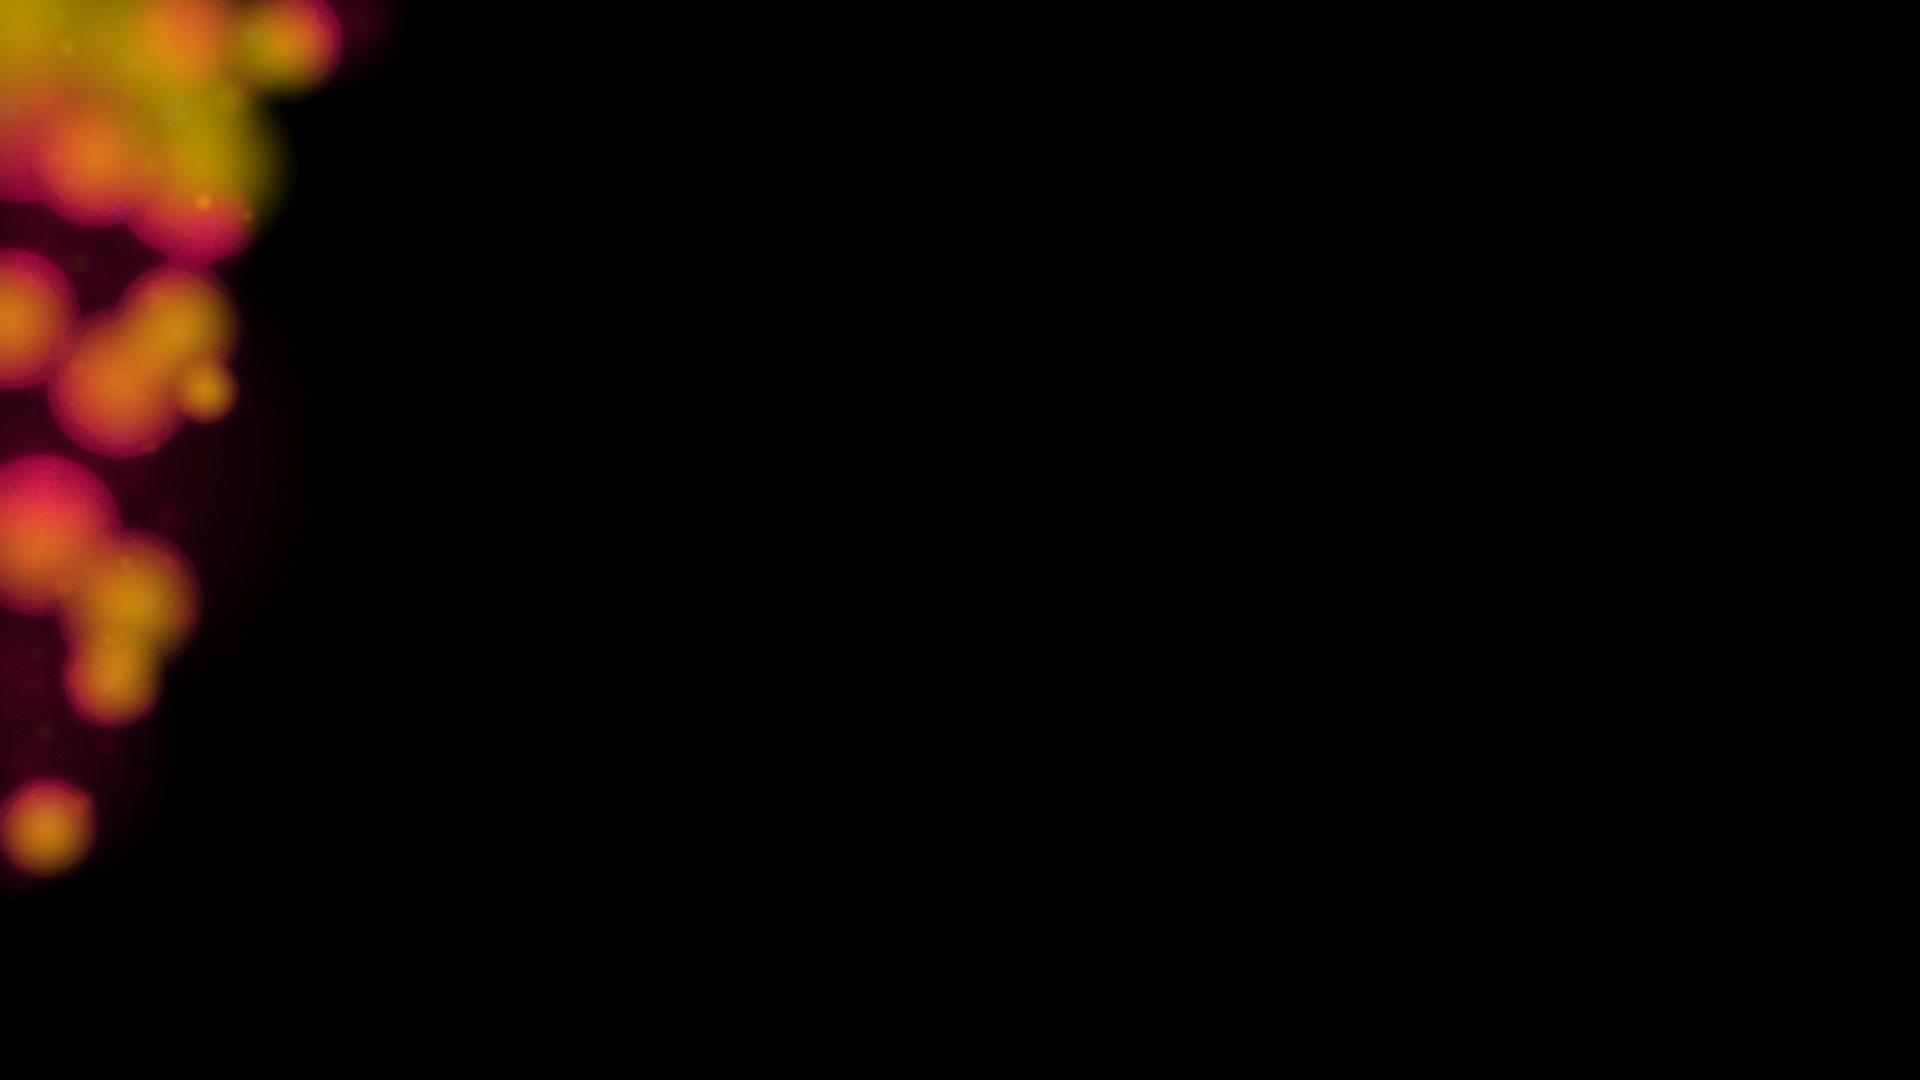 Black Lava Twitter Background 1920x1080